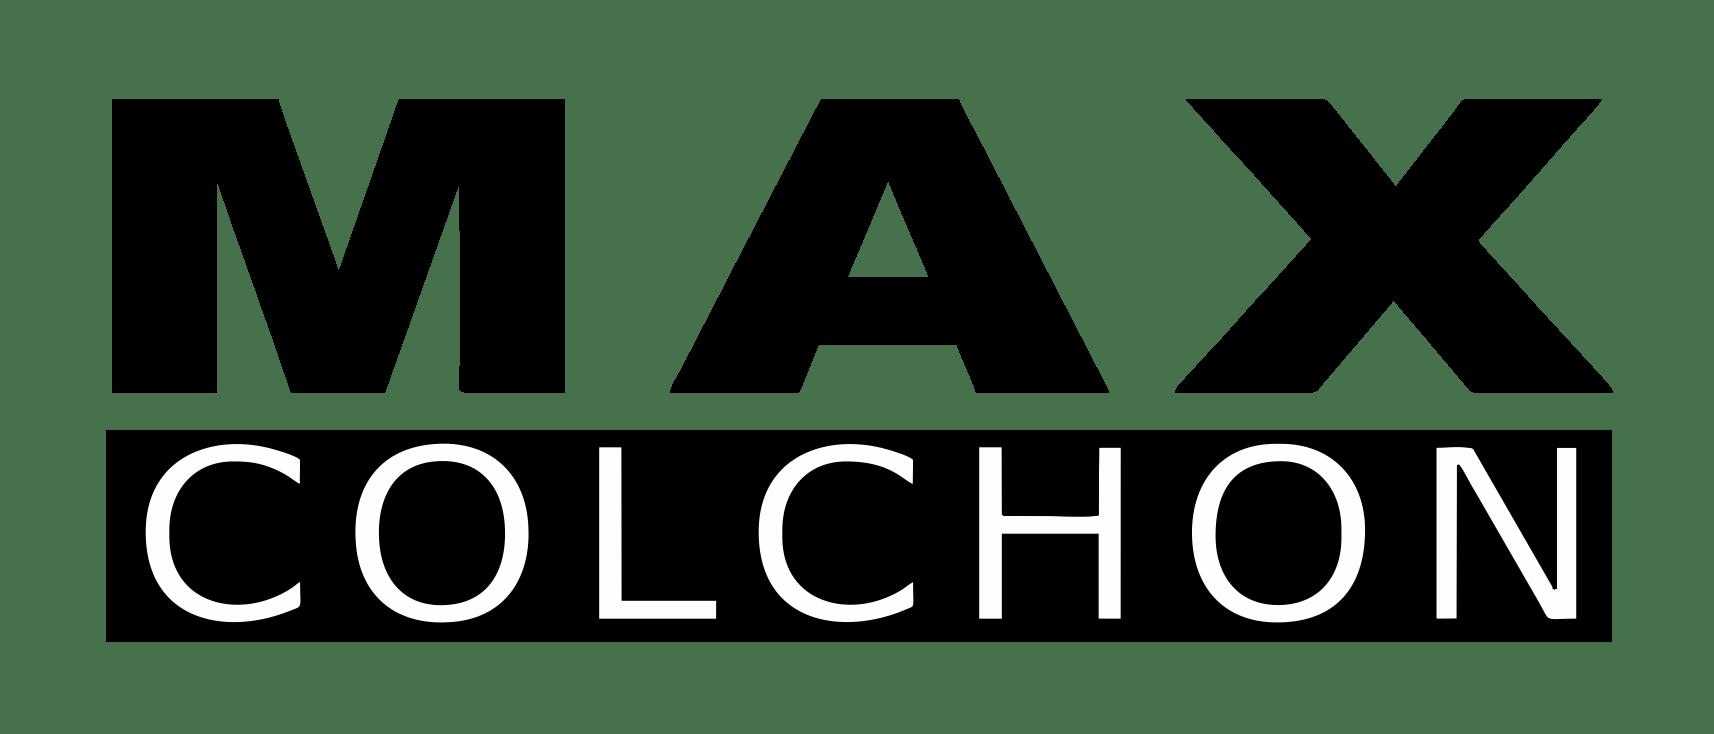 Max Colchon monocromo negro